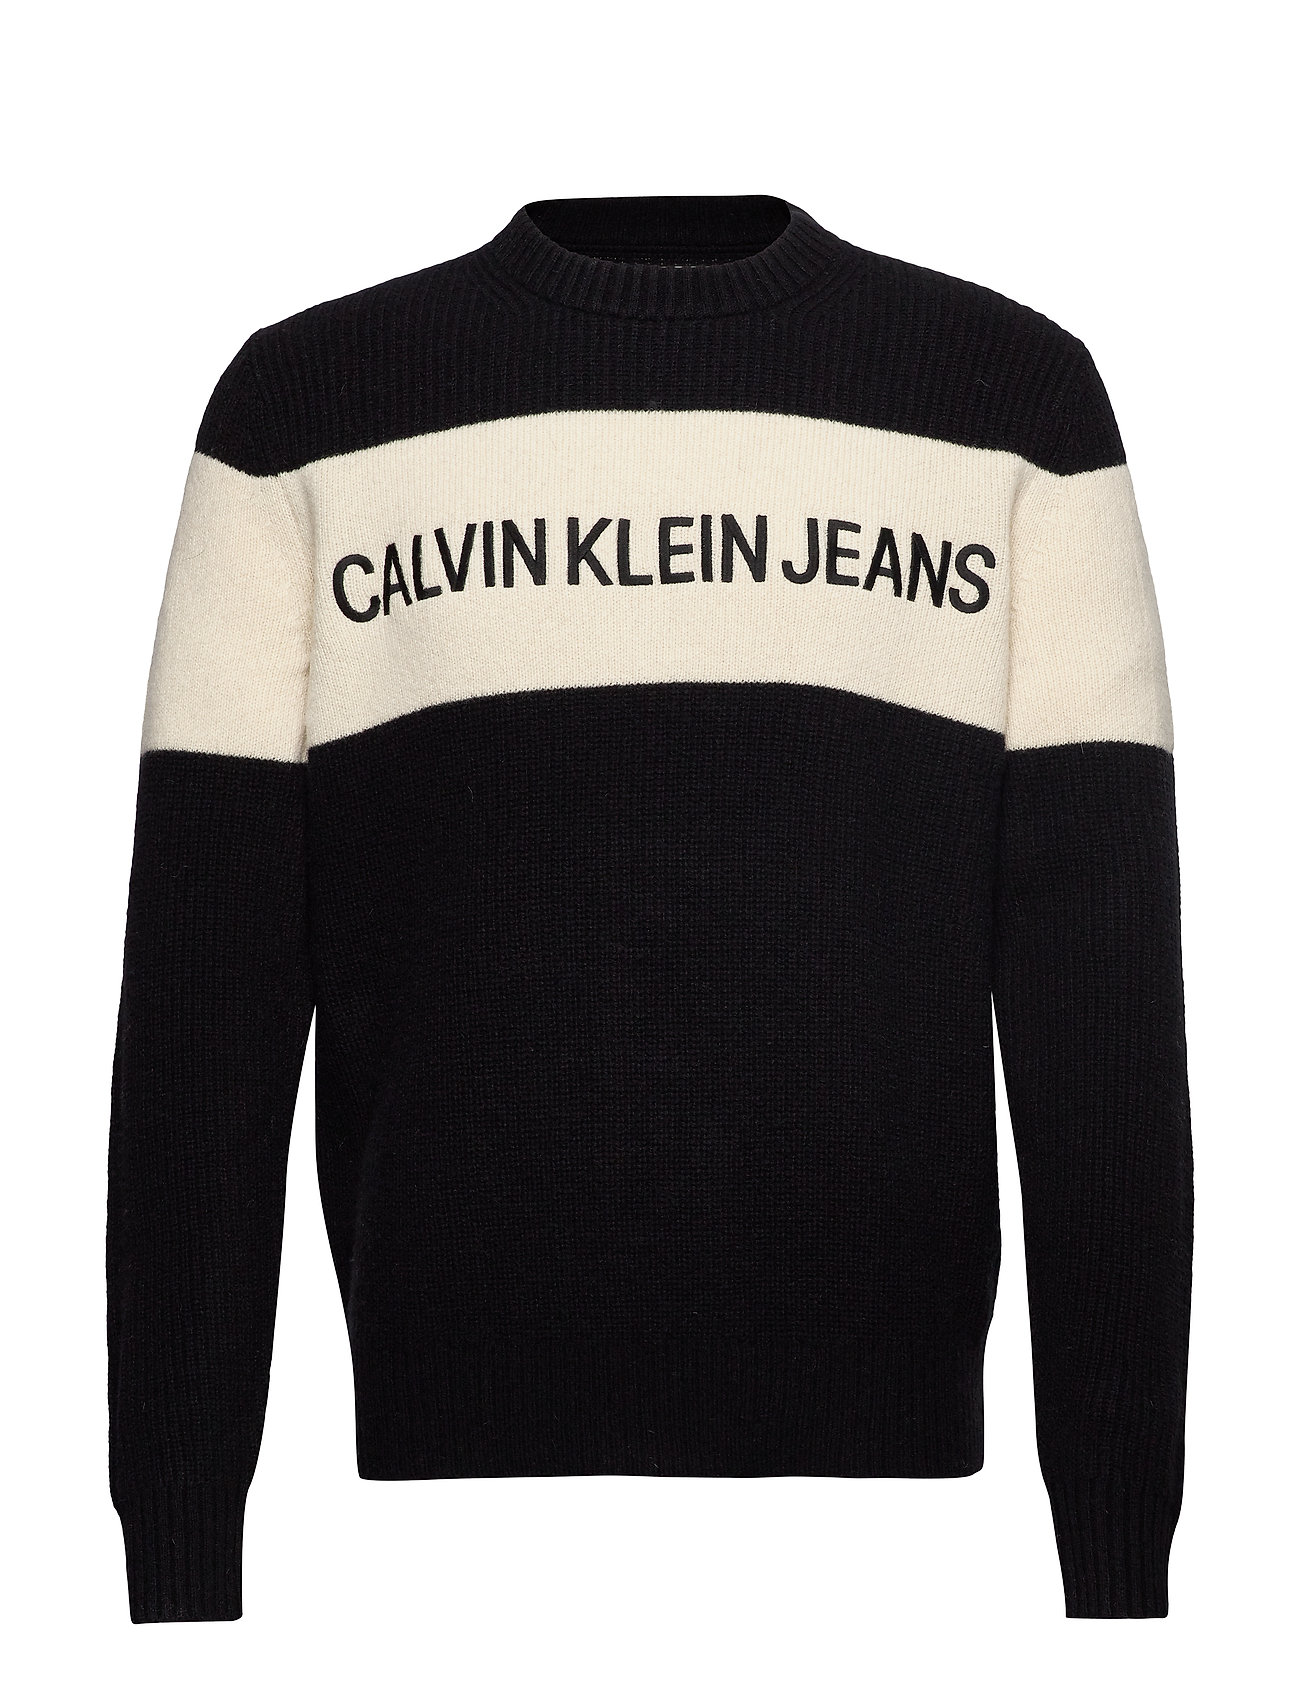 Calvin Klein Jeans COLOUR BLOCK STRIPE - CK BLACK